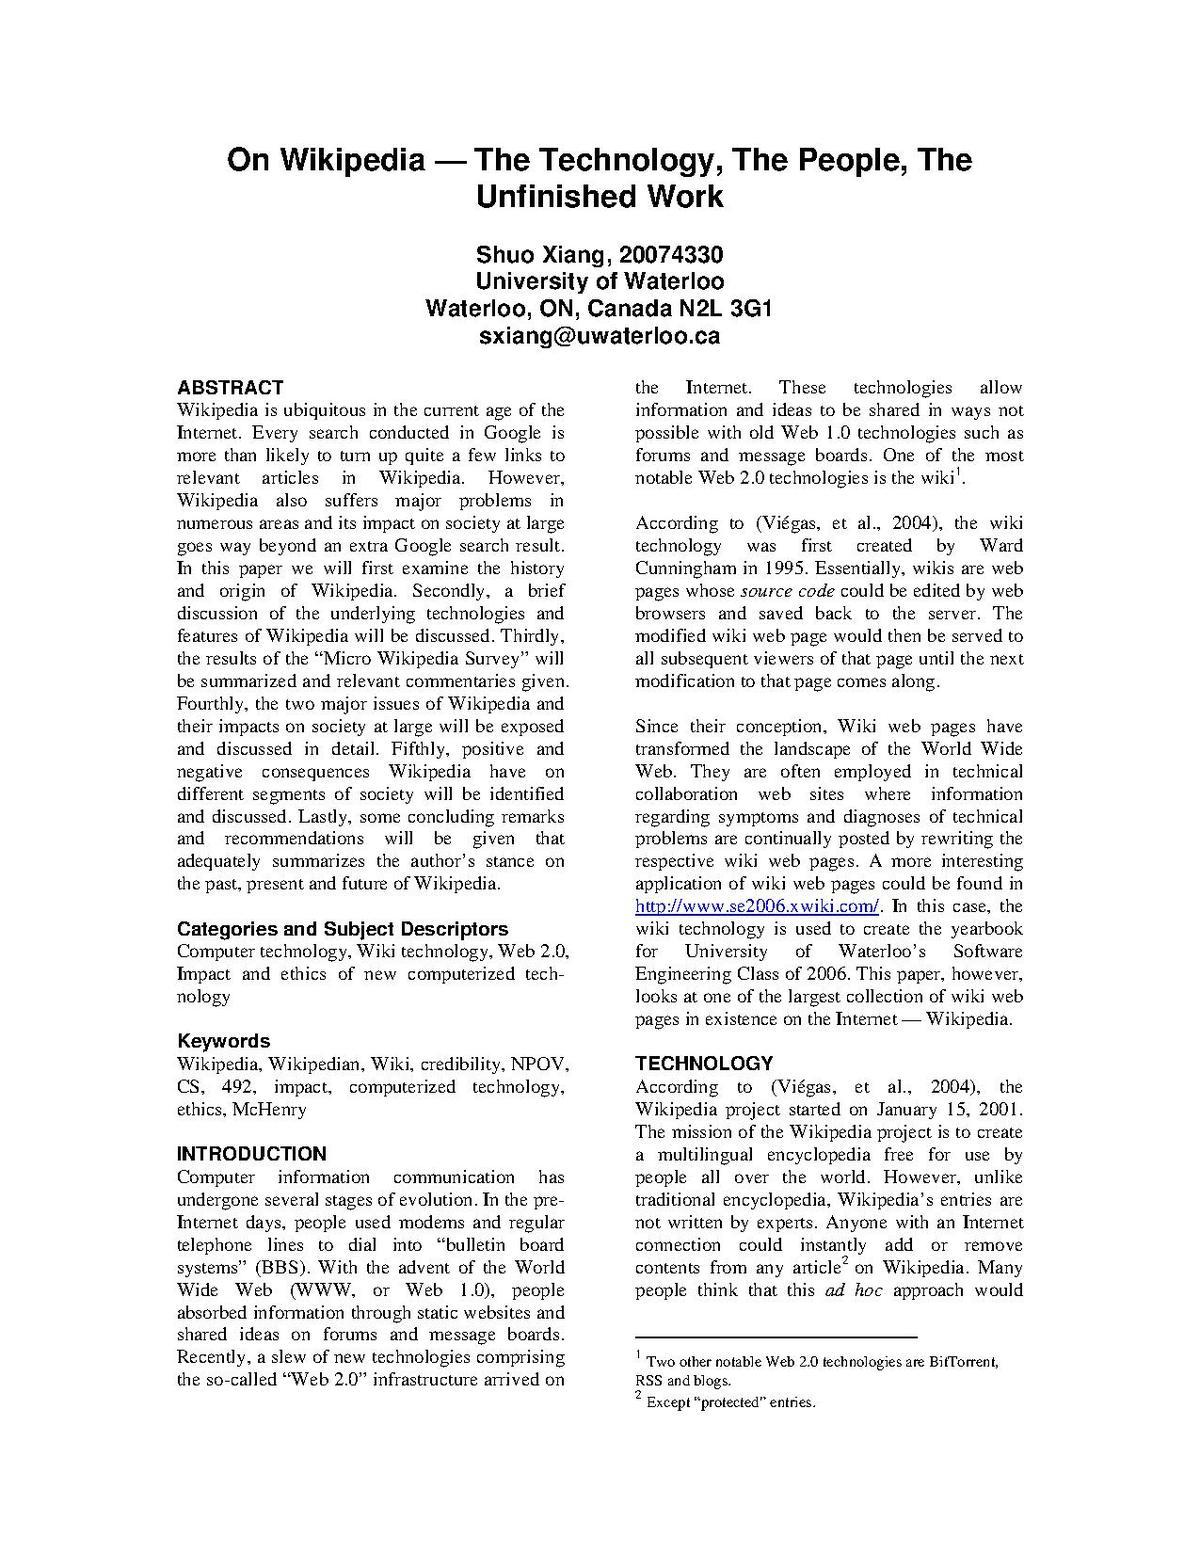 File:Shuo-Xian-Wikipedia-essay pdf - Wikimedia Commons